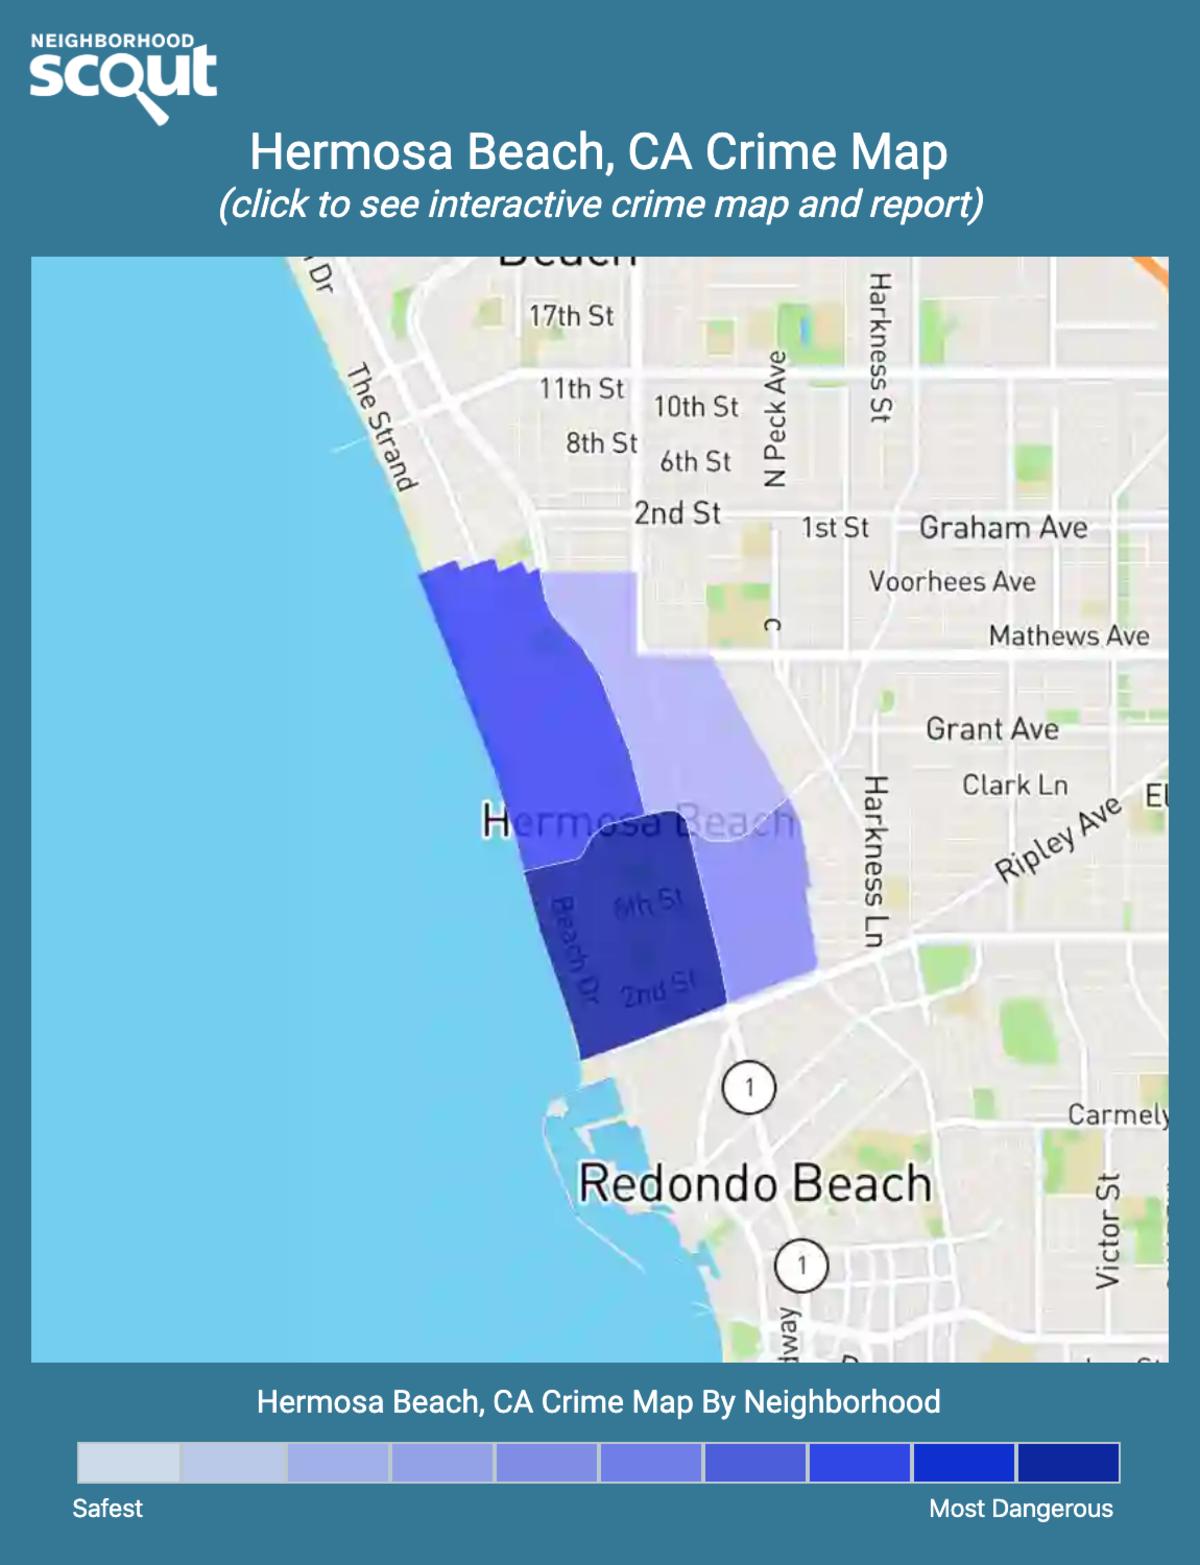 Hermosa Beach, California crime map